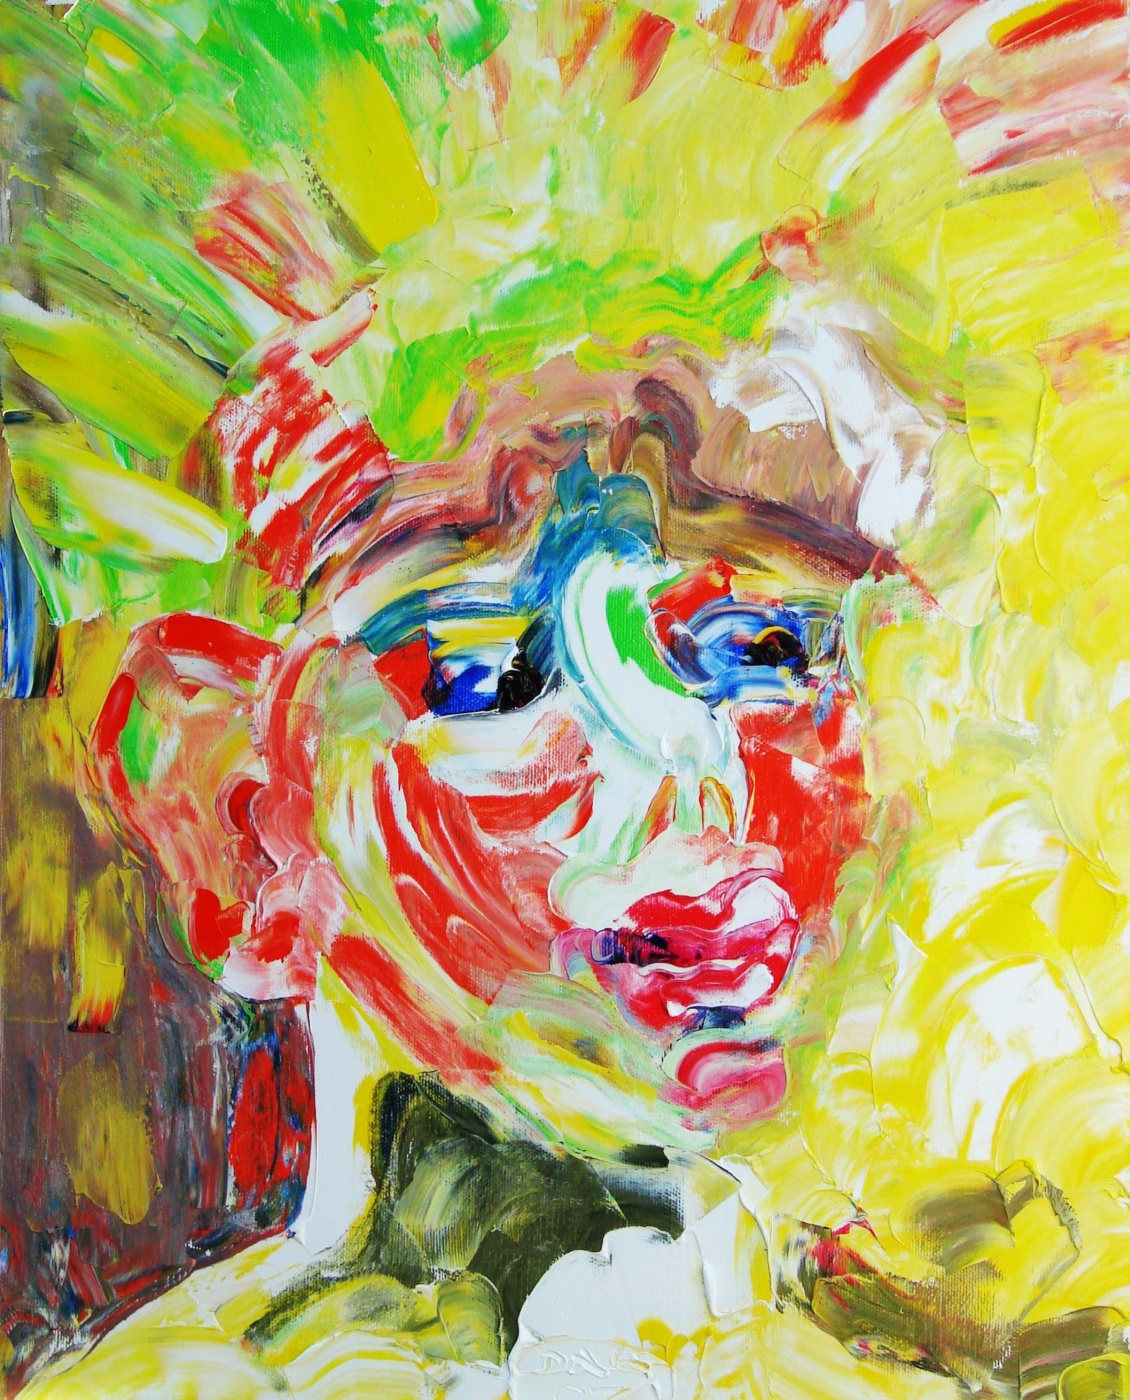 Alexander Ocher Kandinsky-DAE. Sunny boy. (Sasha son of the artist)